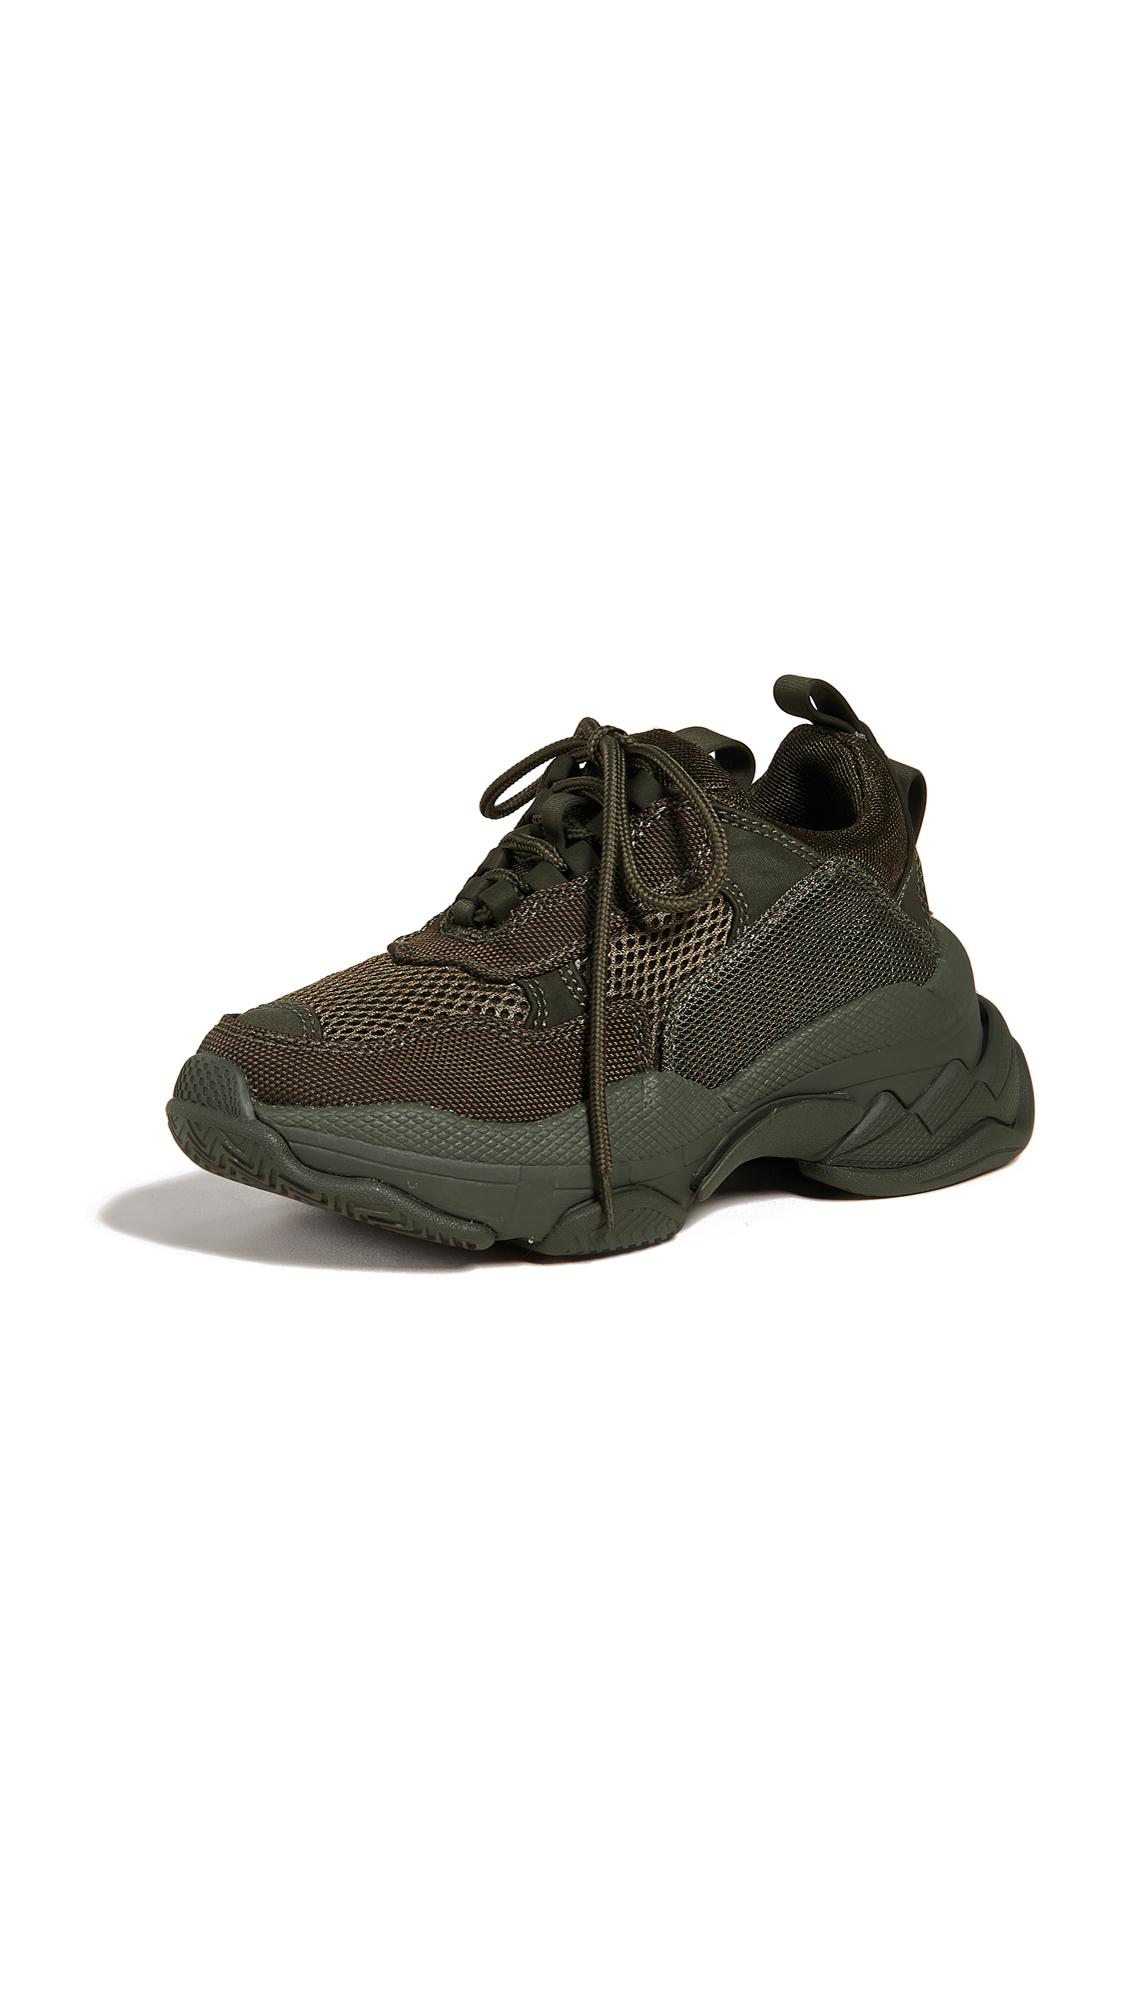 Jeffrey Campbell Lo-Fi Sneakers - Khaki